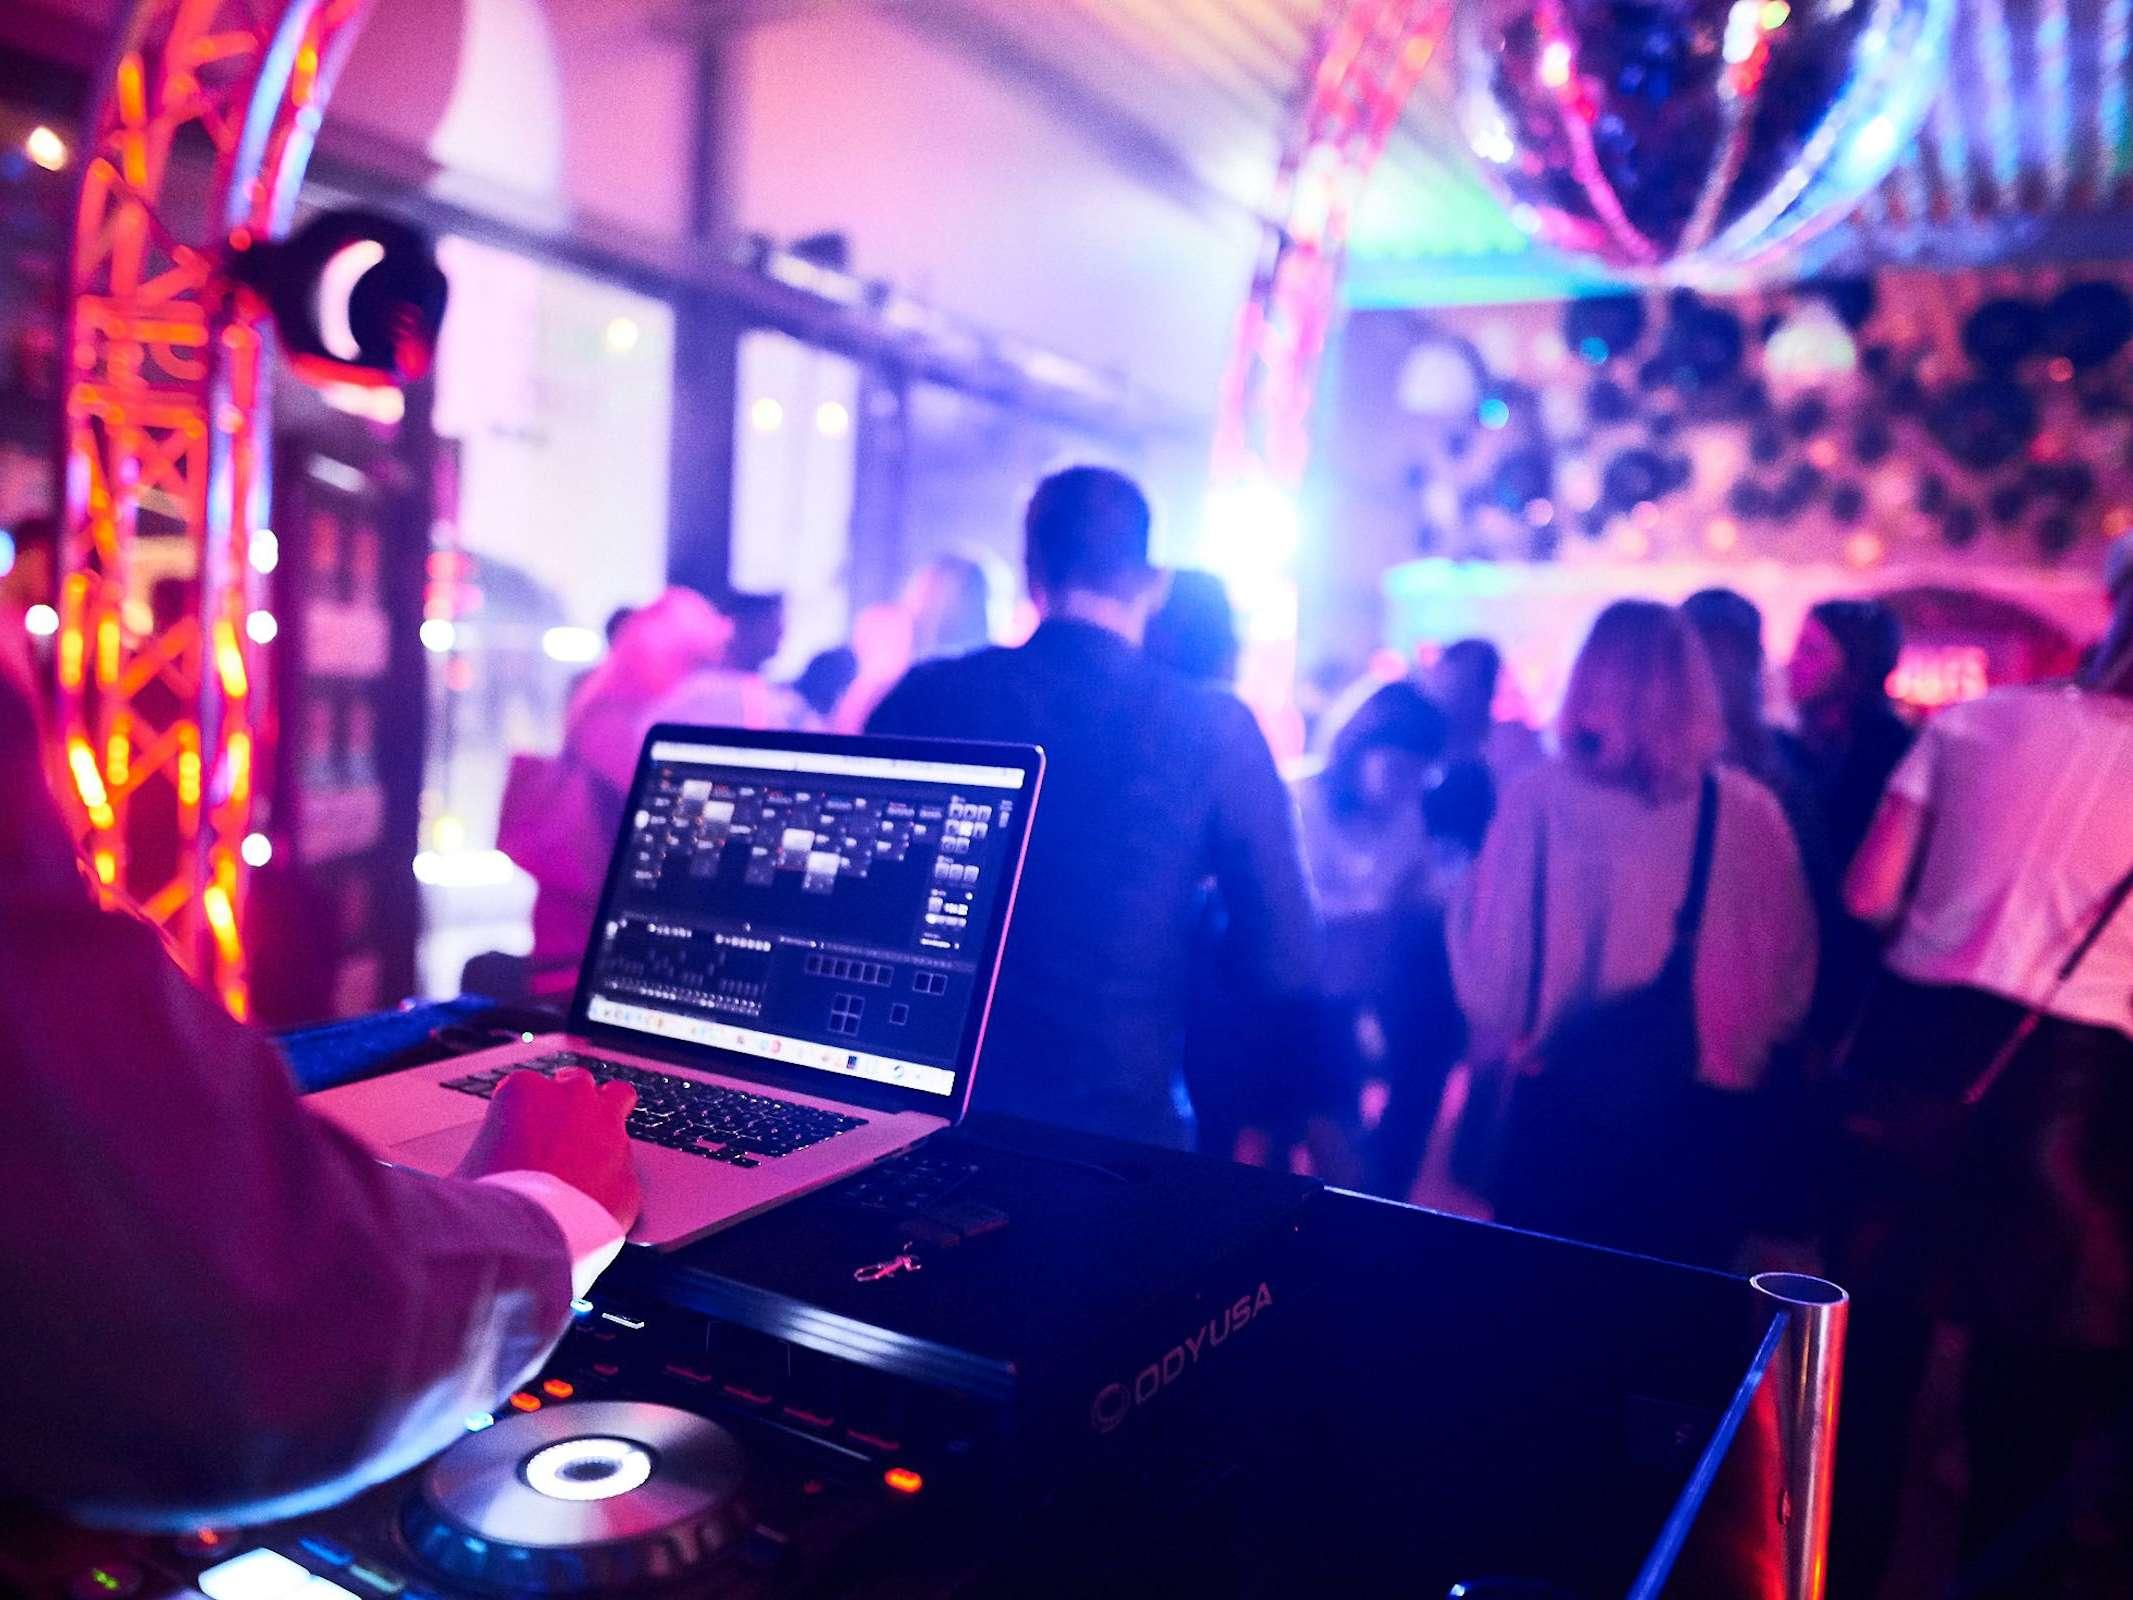 DJ | Plus | Saxophonist | Percussion | Schlagzeug | Gesang | Sängerin | Party | Act | Show | Buchen | Anfragen | Mieten | Hochzeit | Firmenfeier | Messeparty | Modern | Jukes